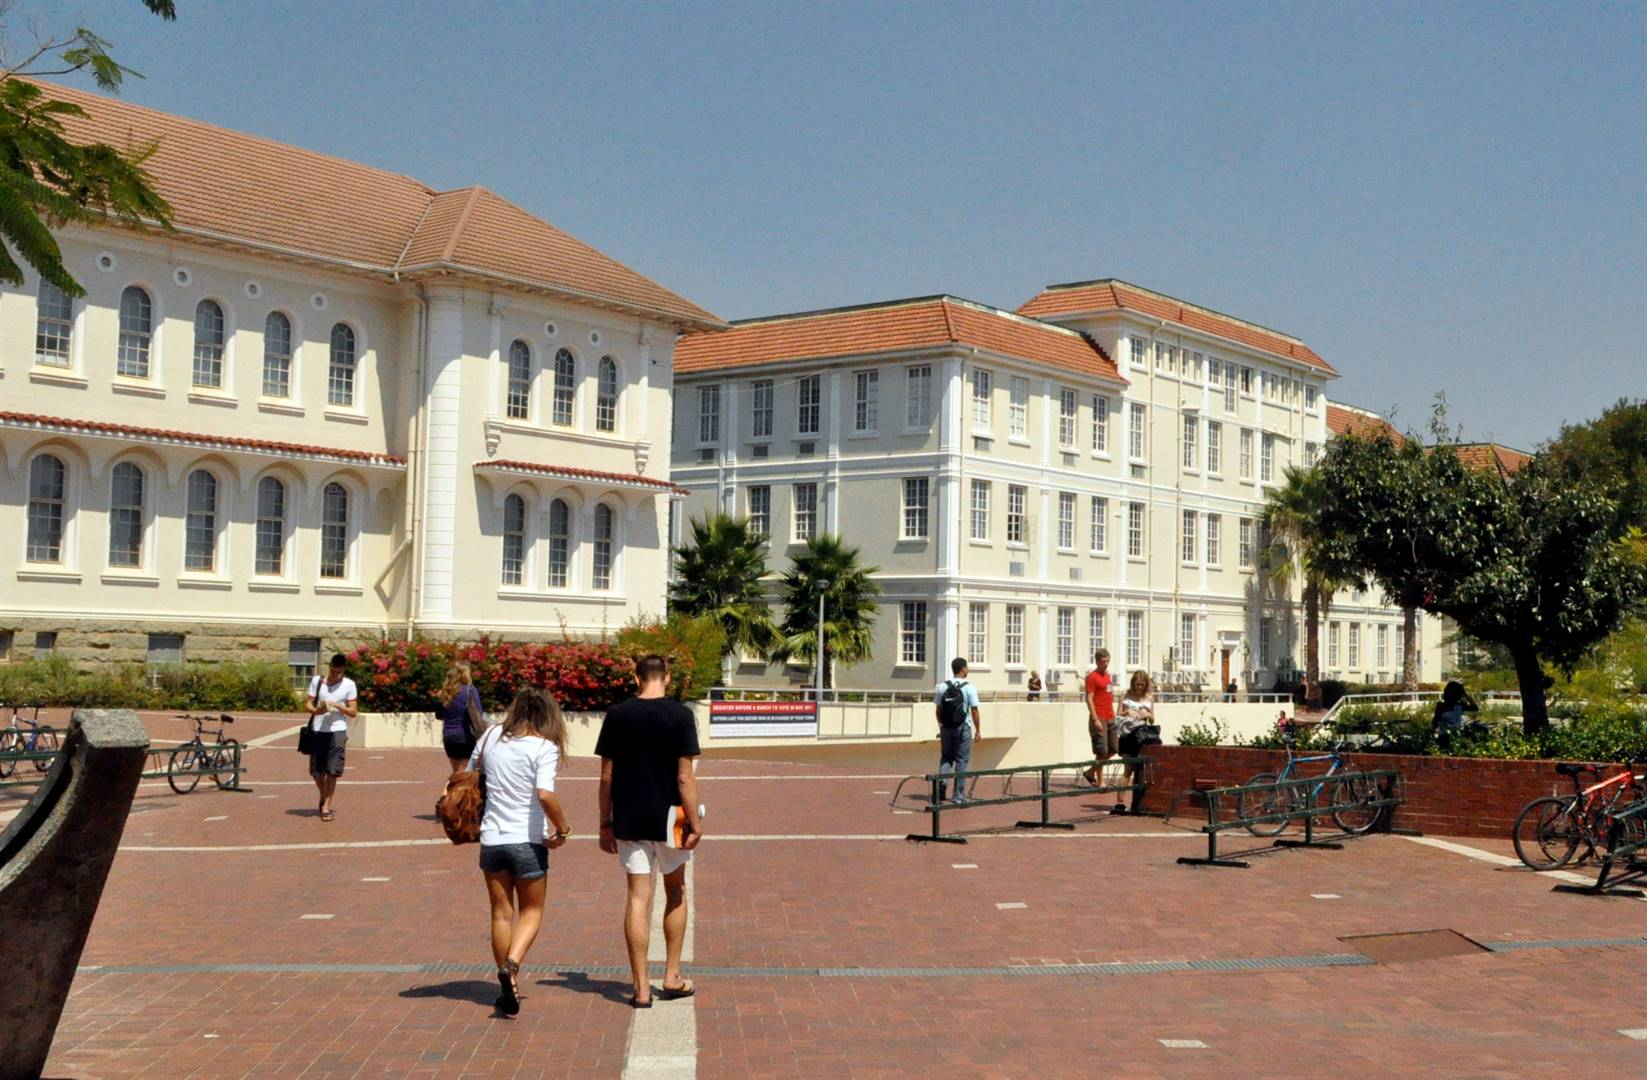 A Stellenbosch University campus.